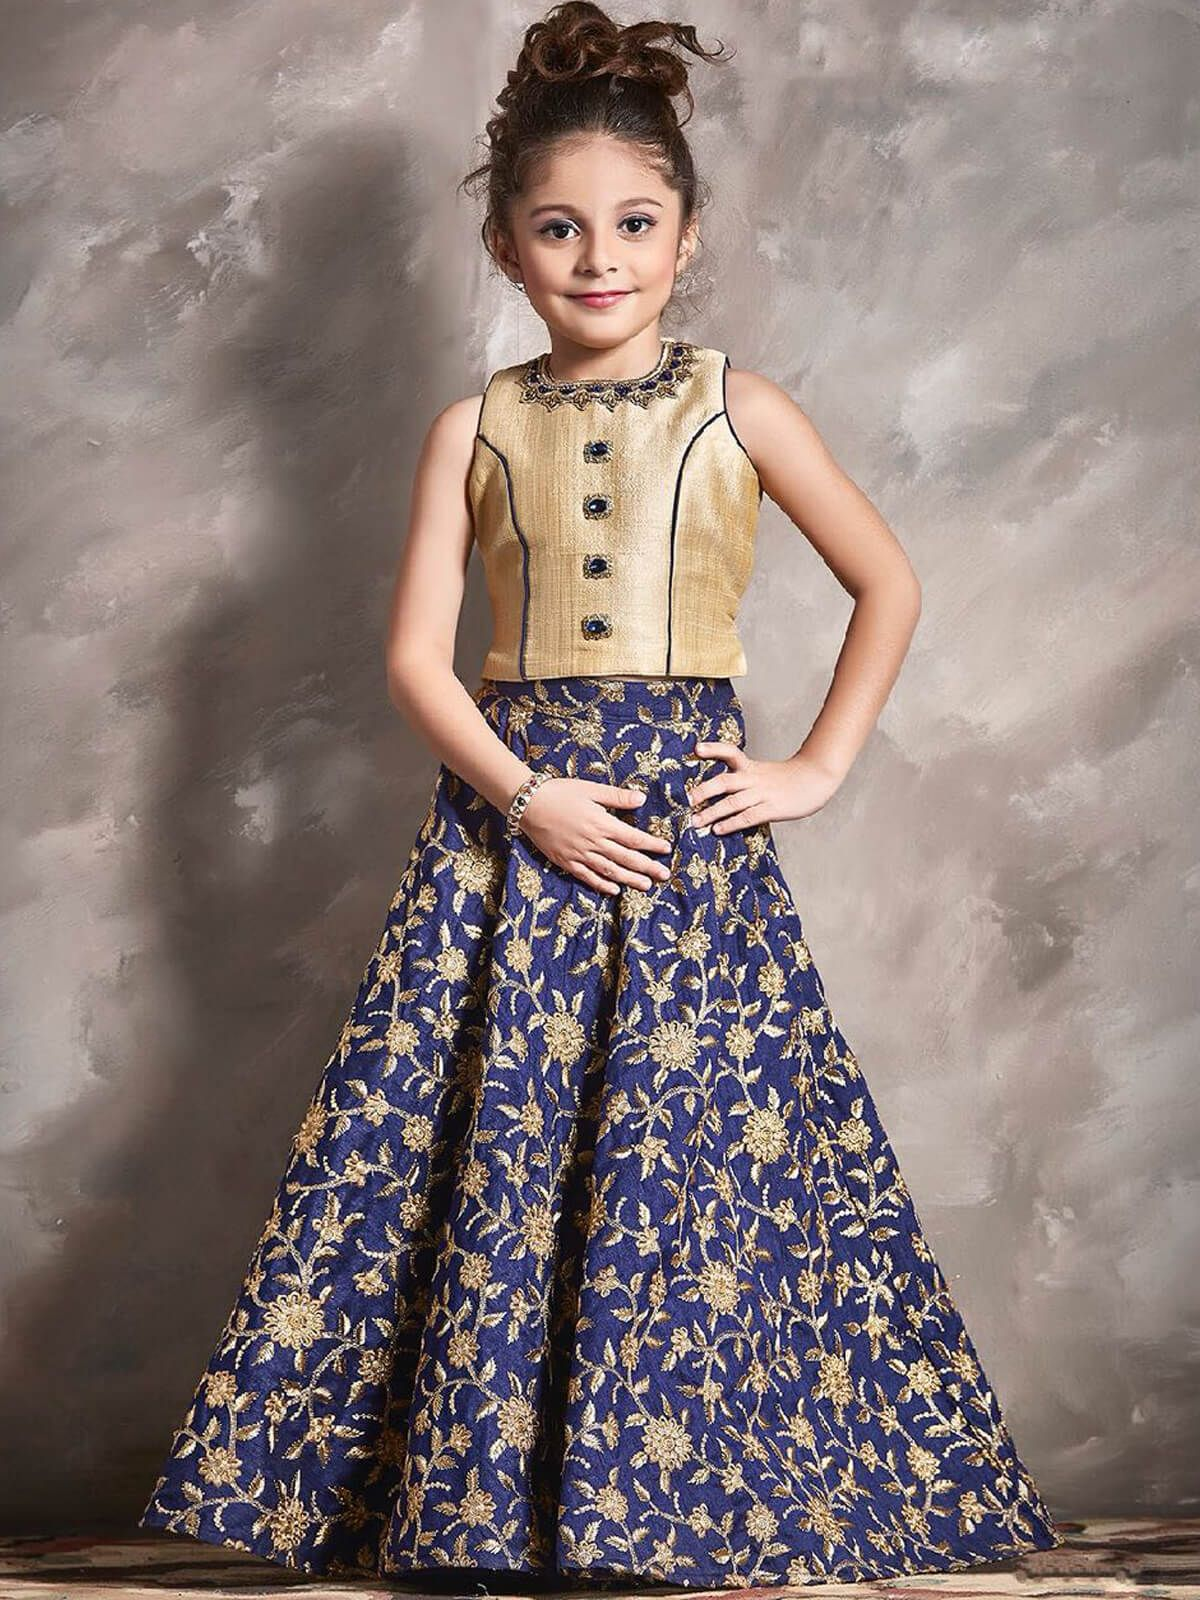 Genial cream silk party wear kids gown mydesiwear onlineshopping